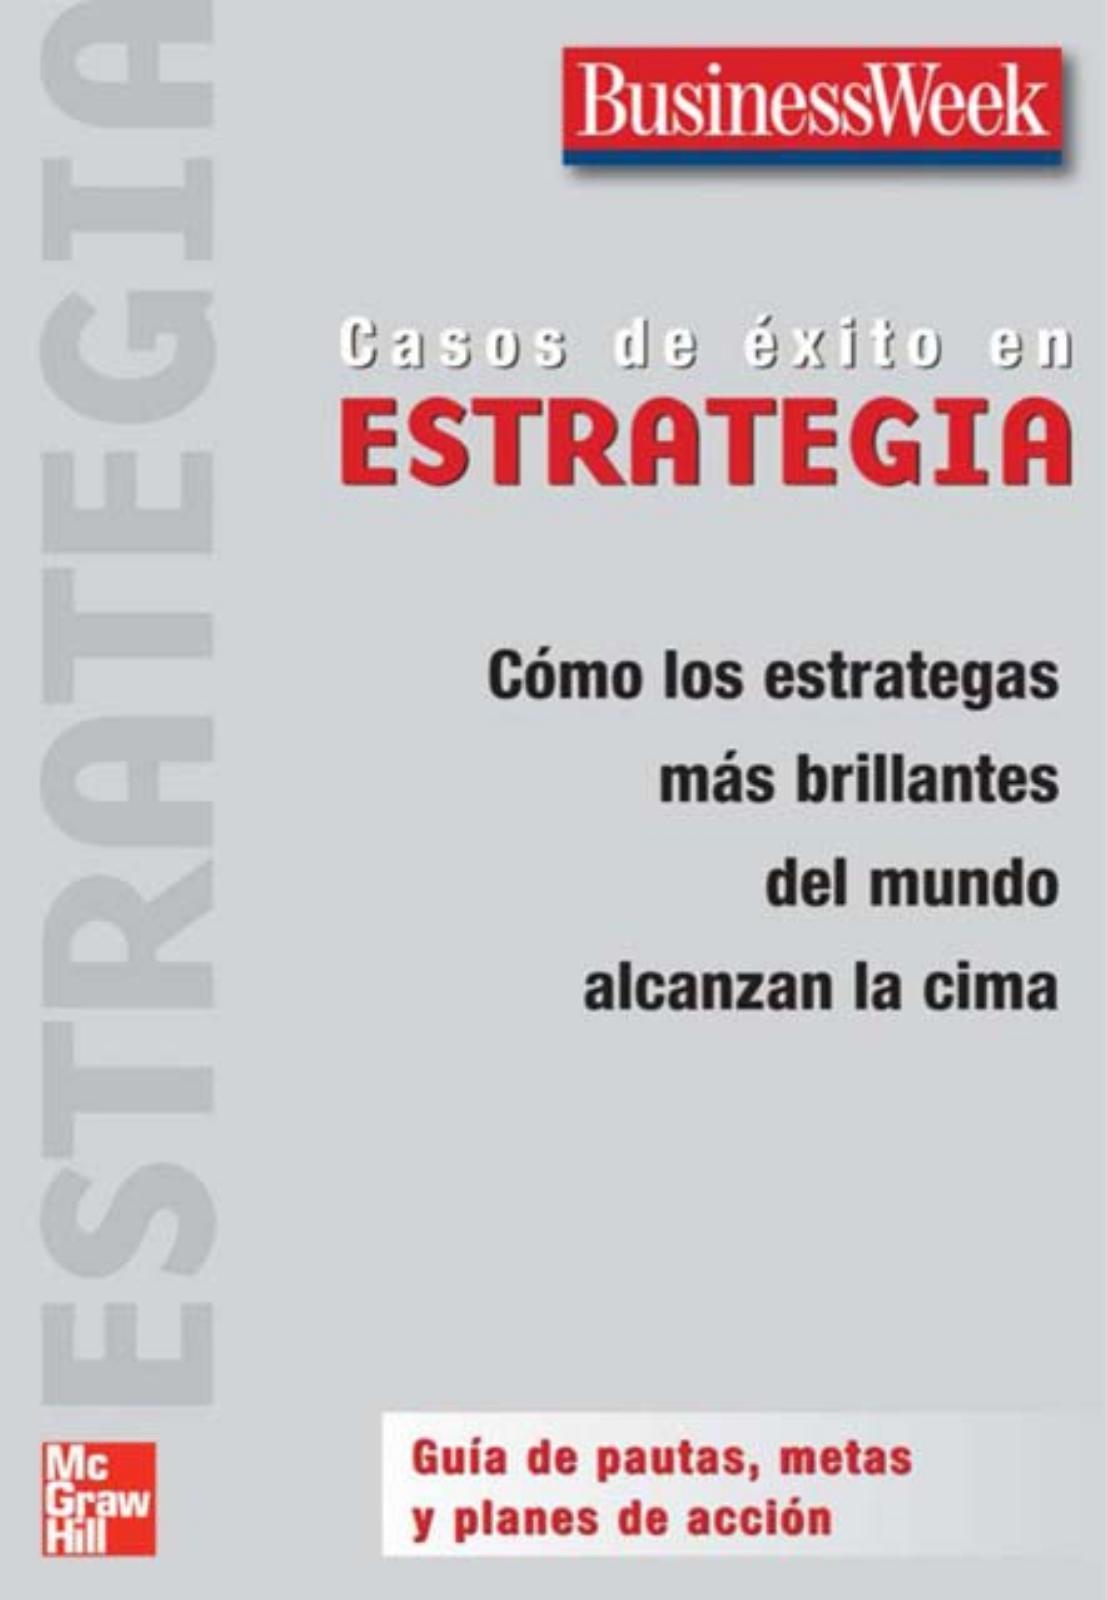 Calaméo - Casosdeexitoenestrategia 170131042951